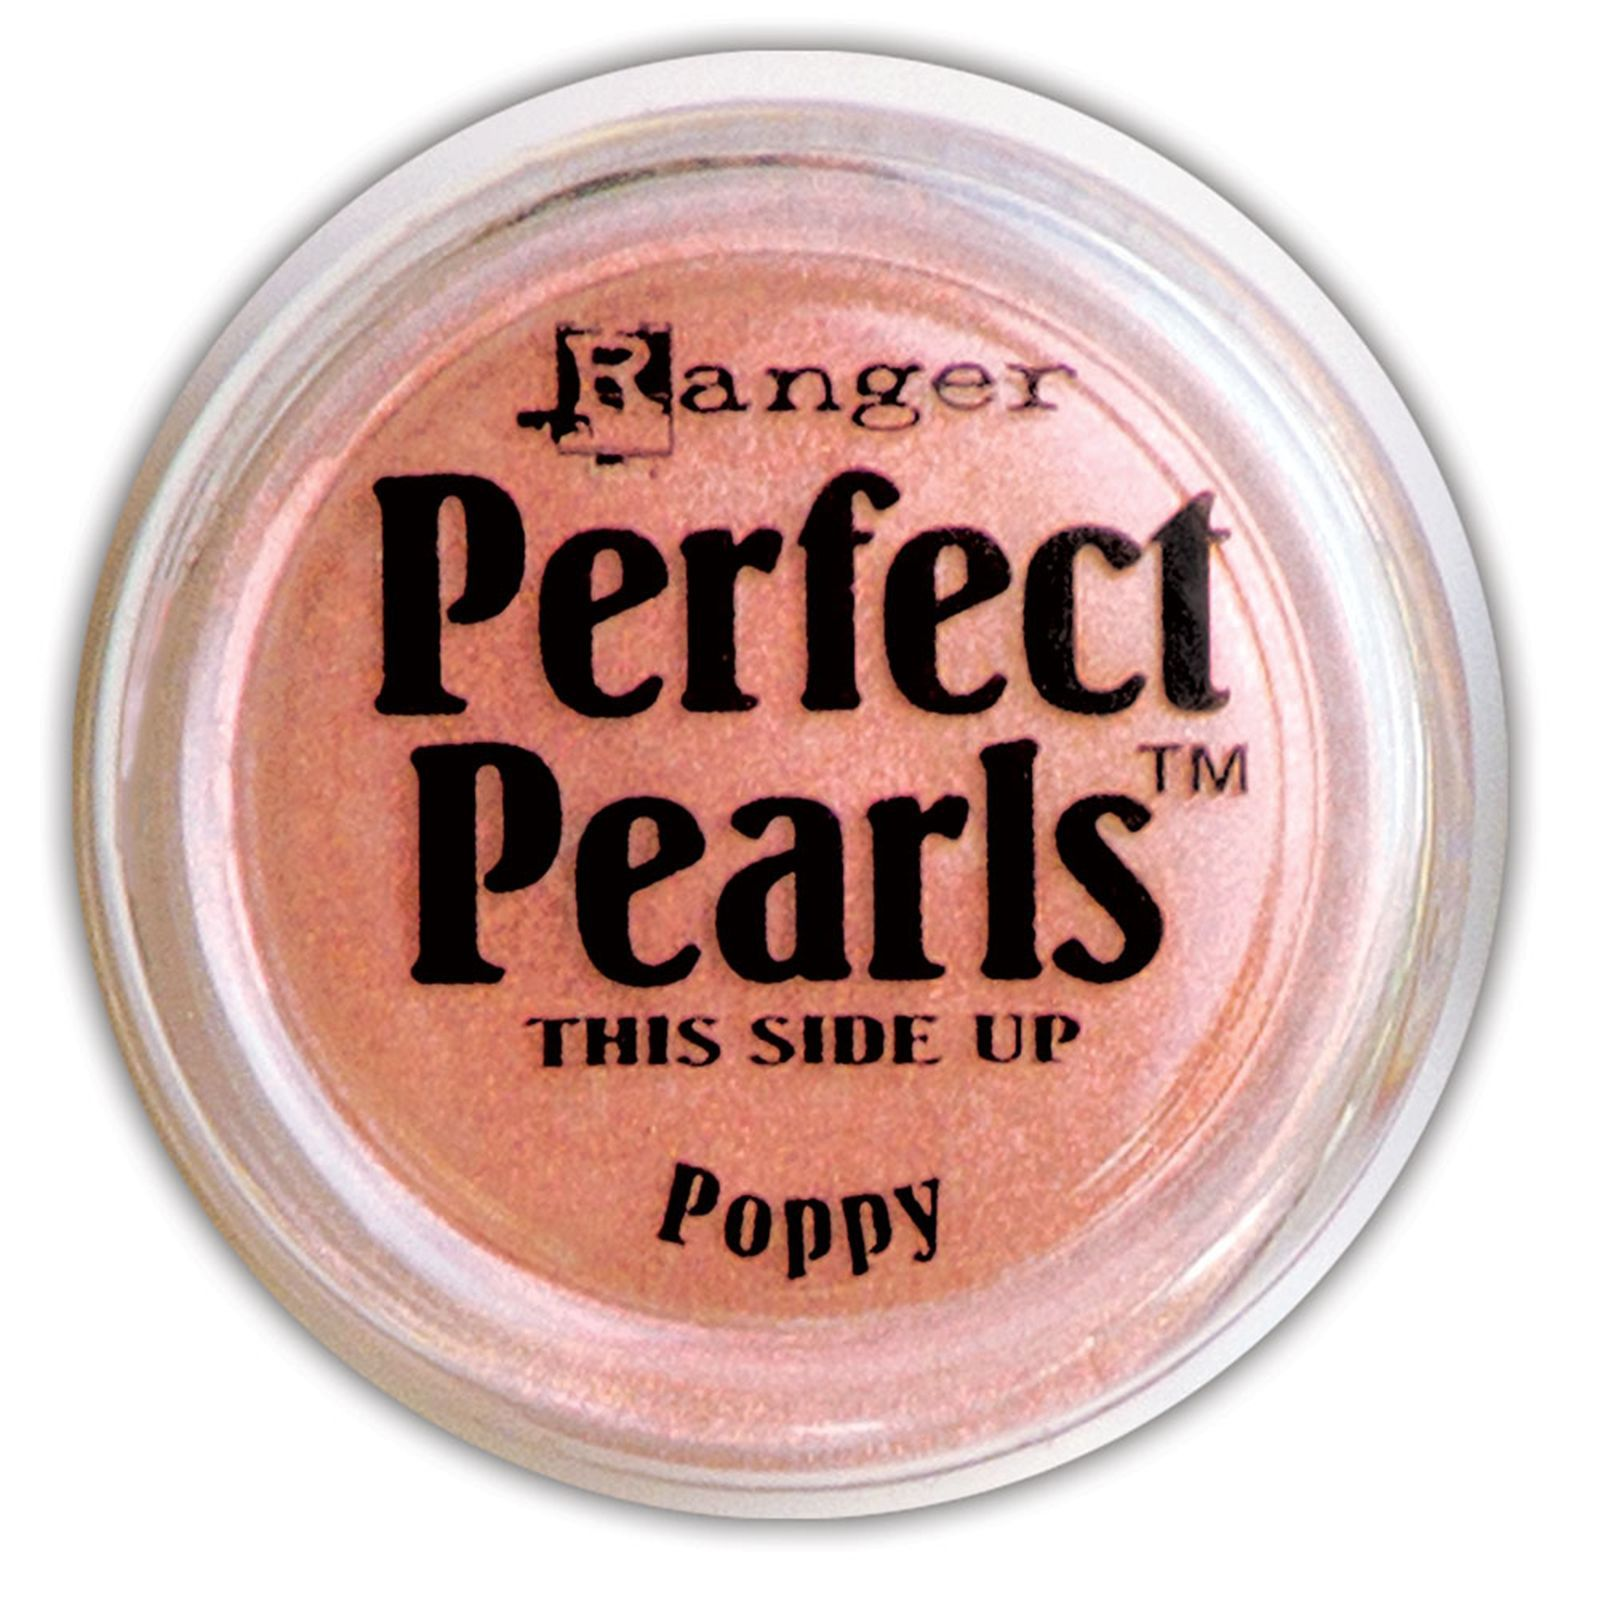 Perfect pearl pigment powder - poppy